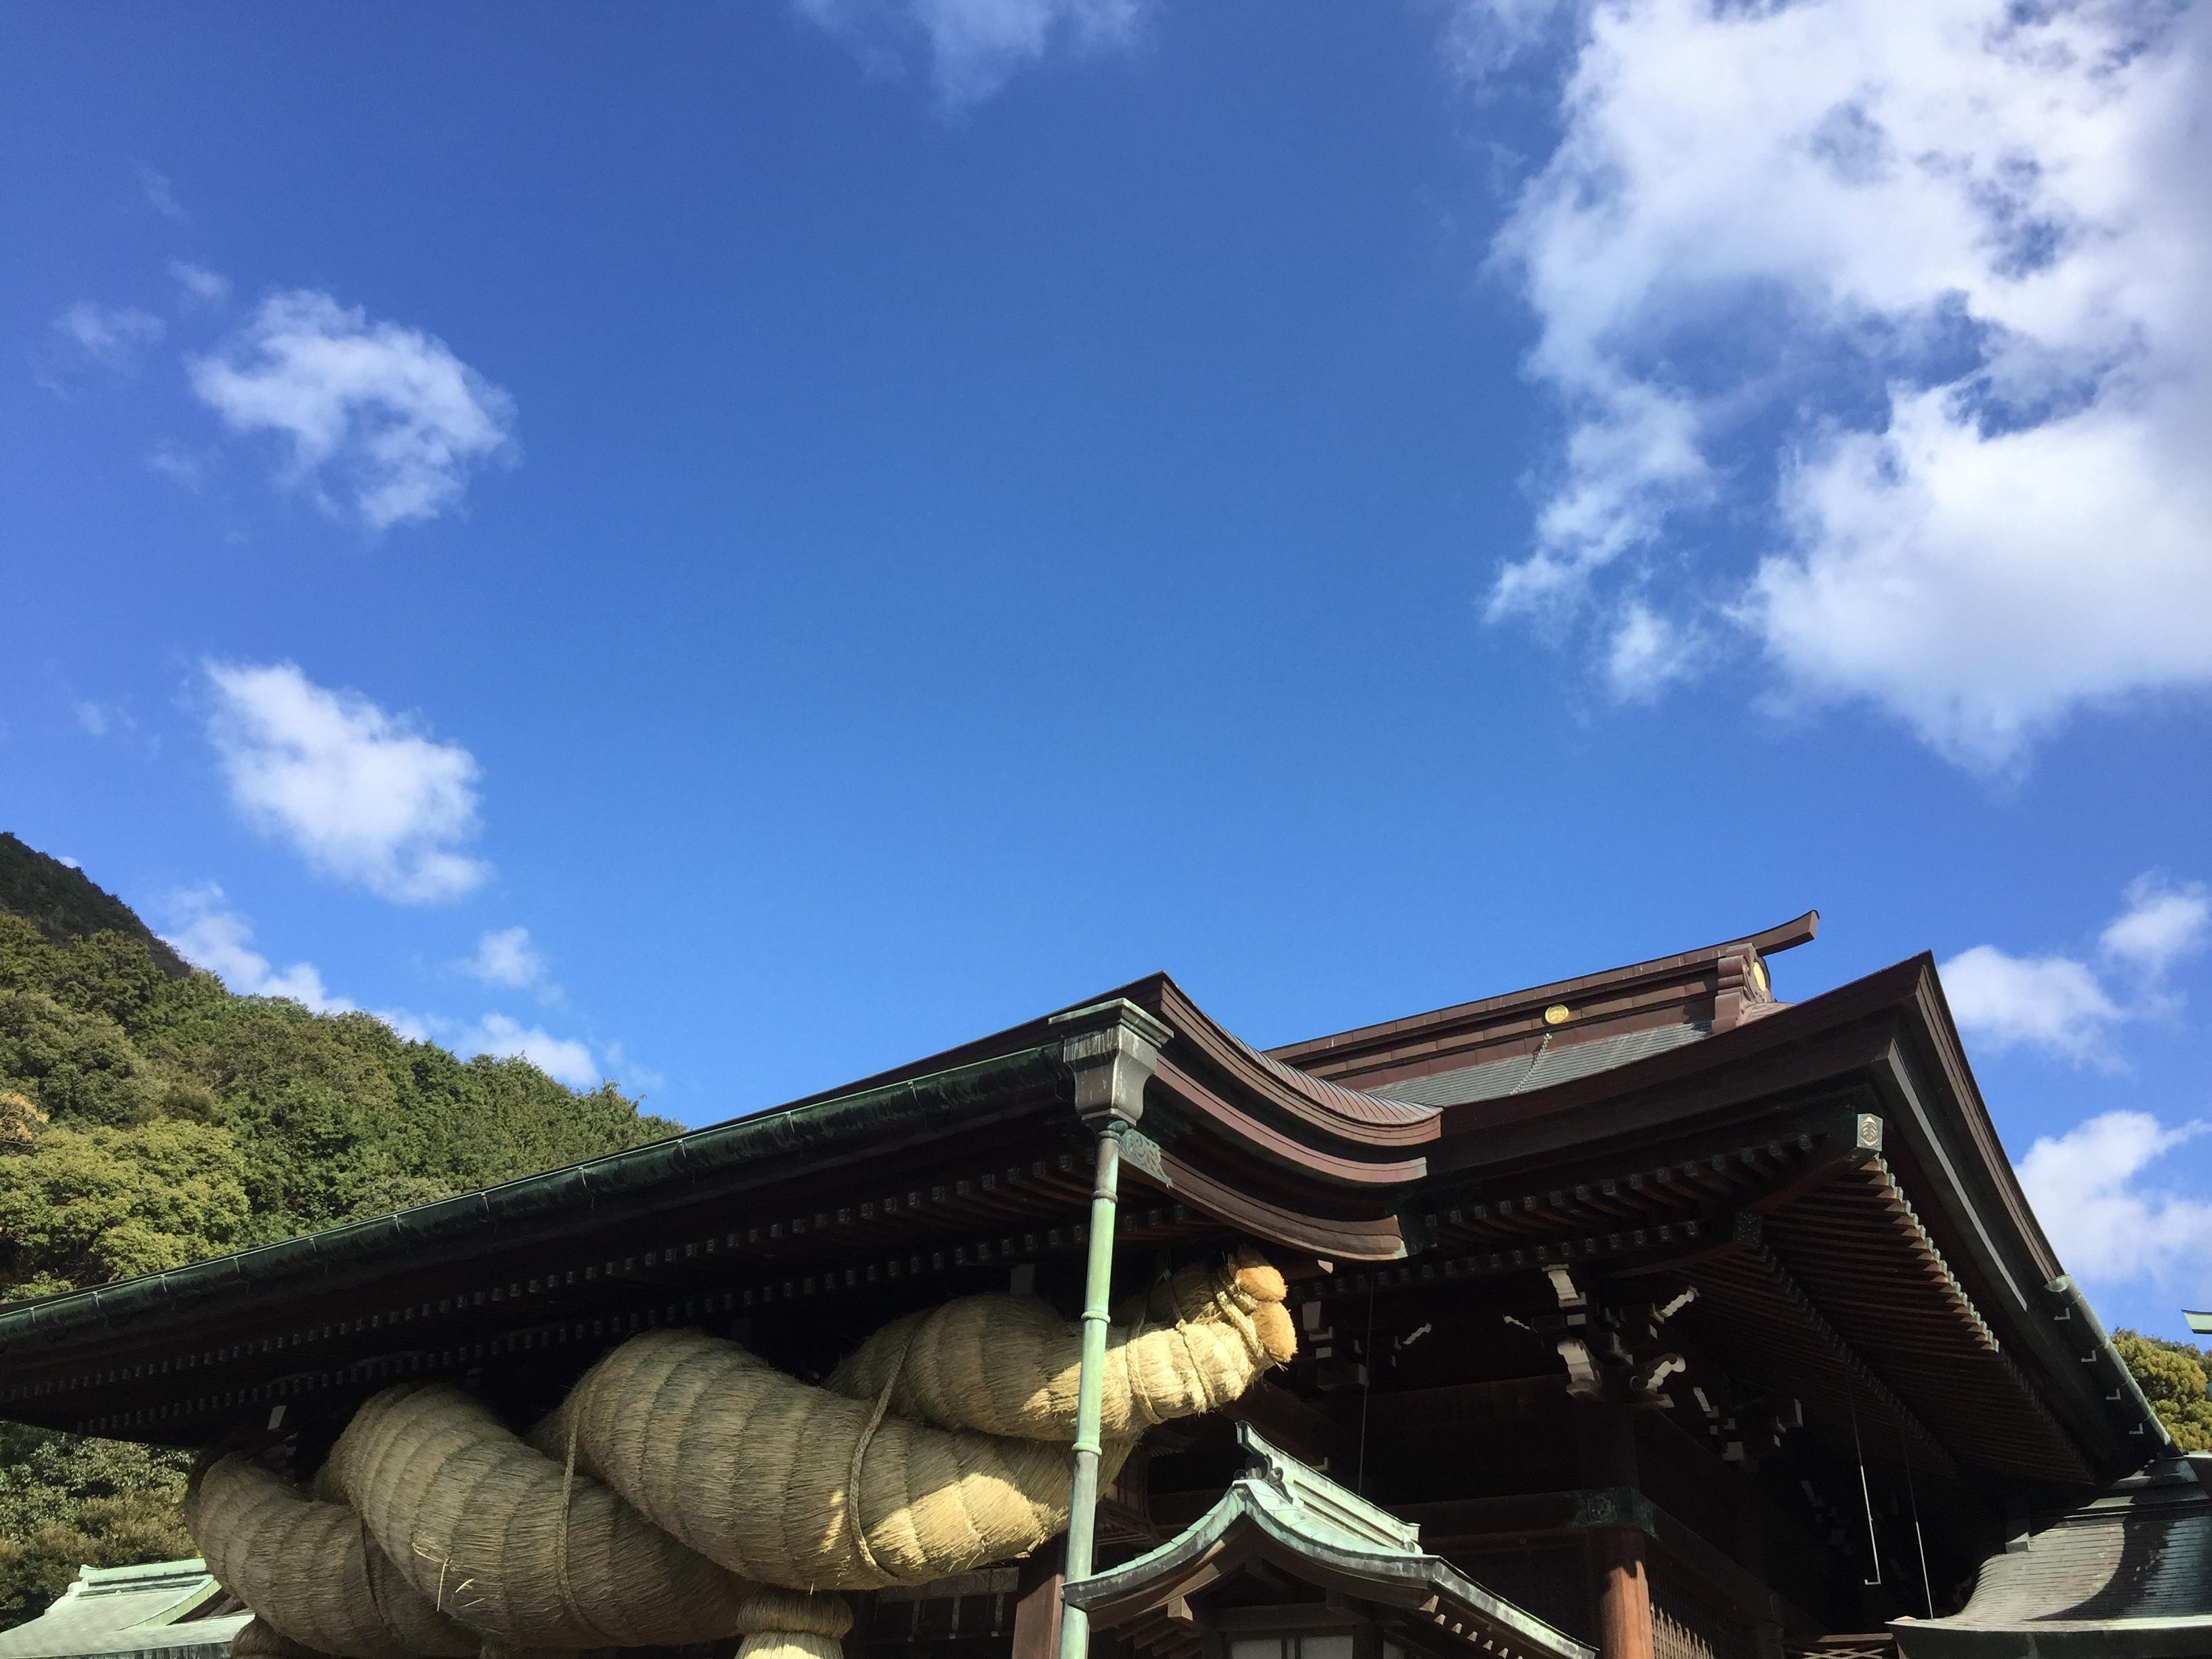 IMG_2731 - 坂井工務店 | 山口県山口市佐山 | 木造住宅、注文住宅の工務店